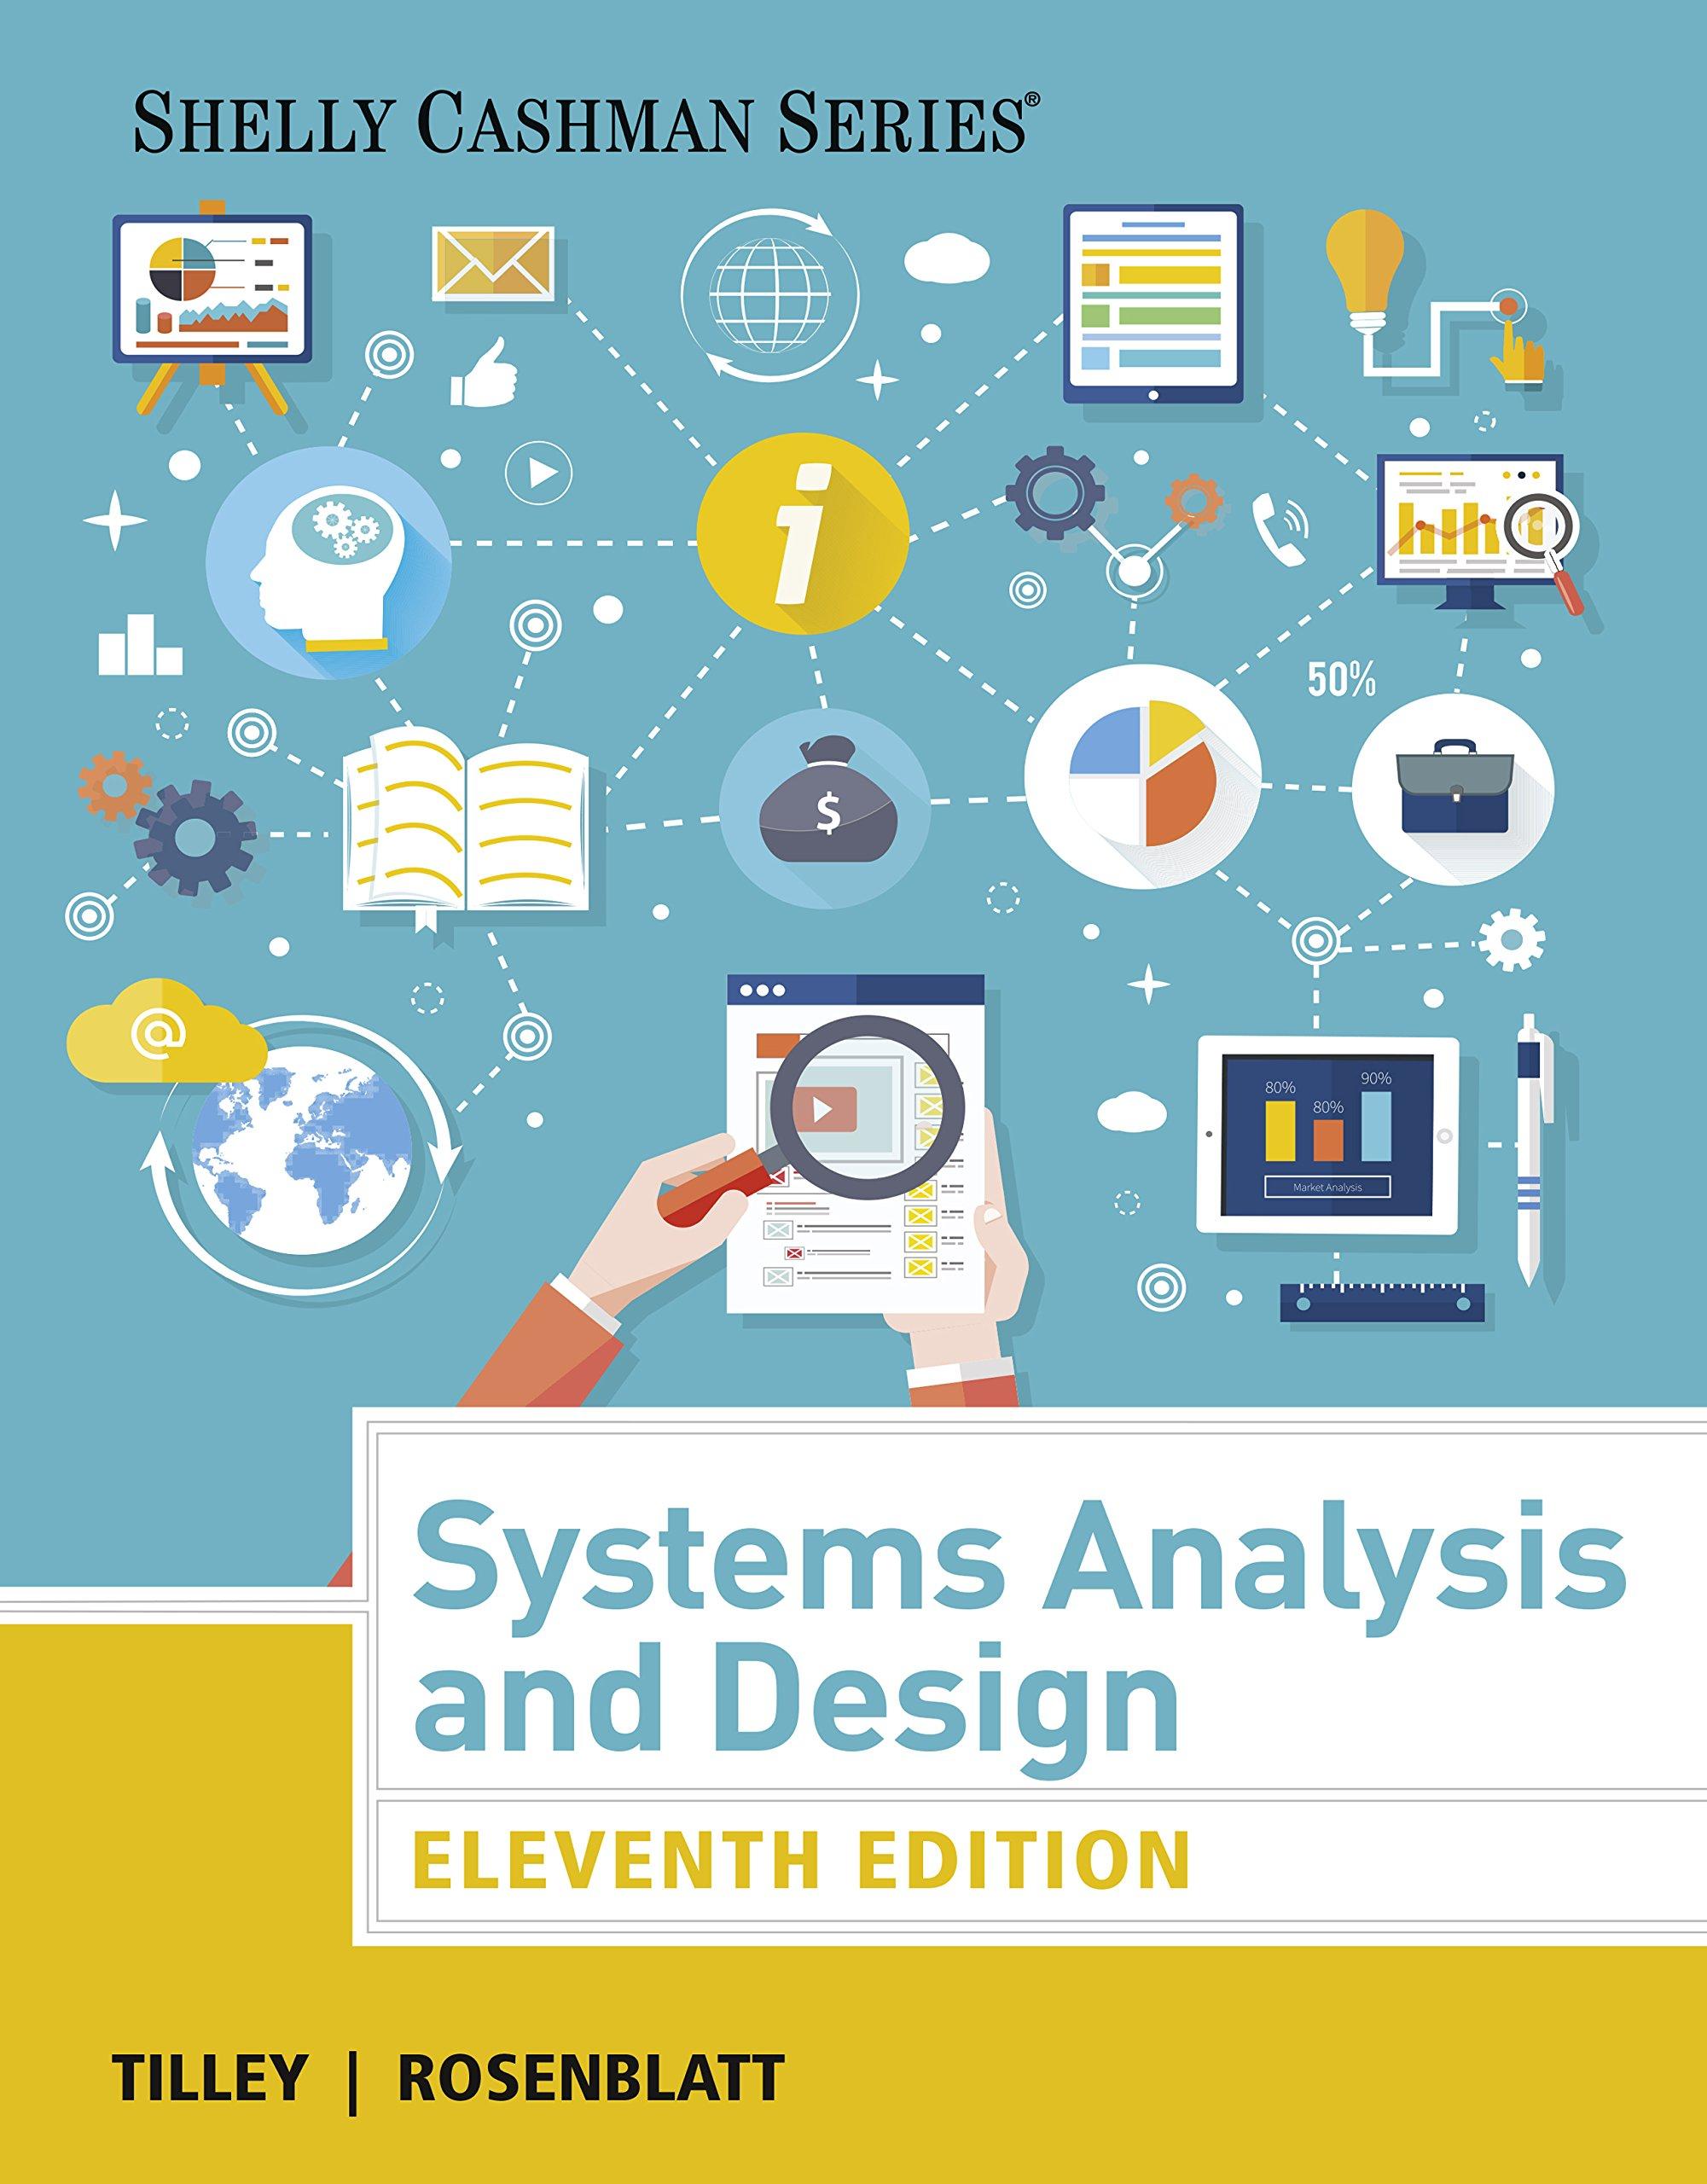 Systems Analysis And Design Shelly Cashman Series 011 Tilley Scott Rosenblatt Harry J Ebook Amazon Com